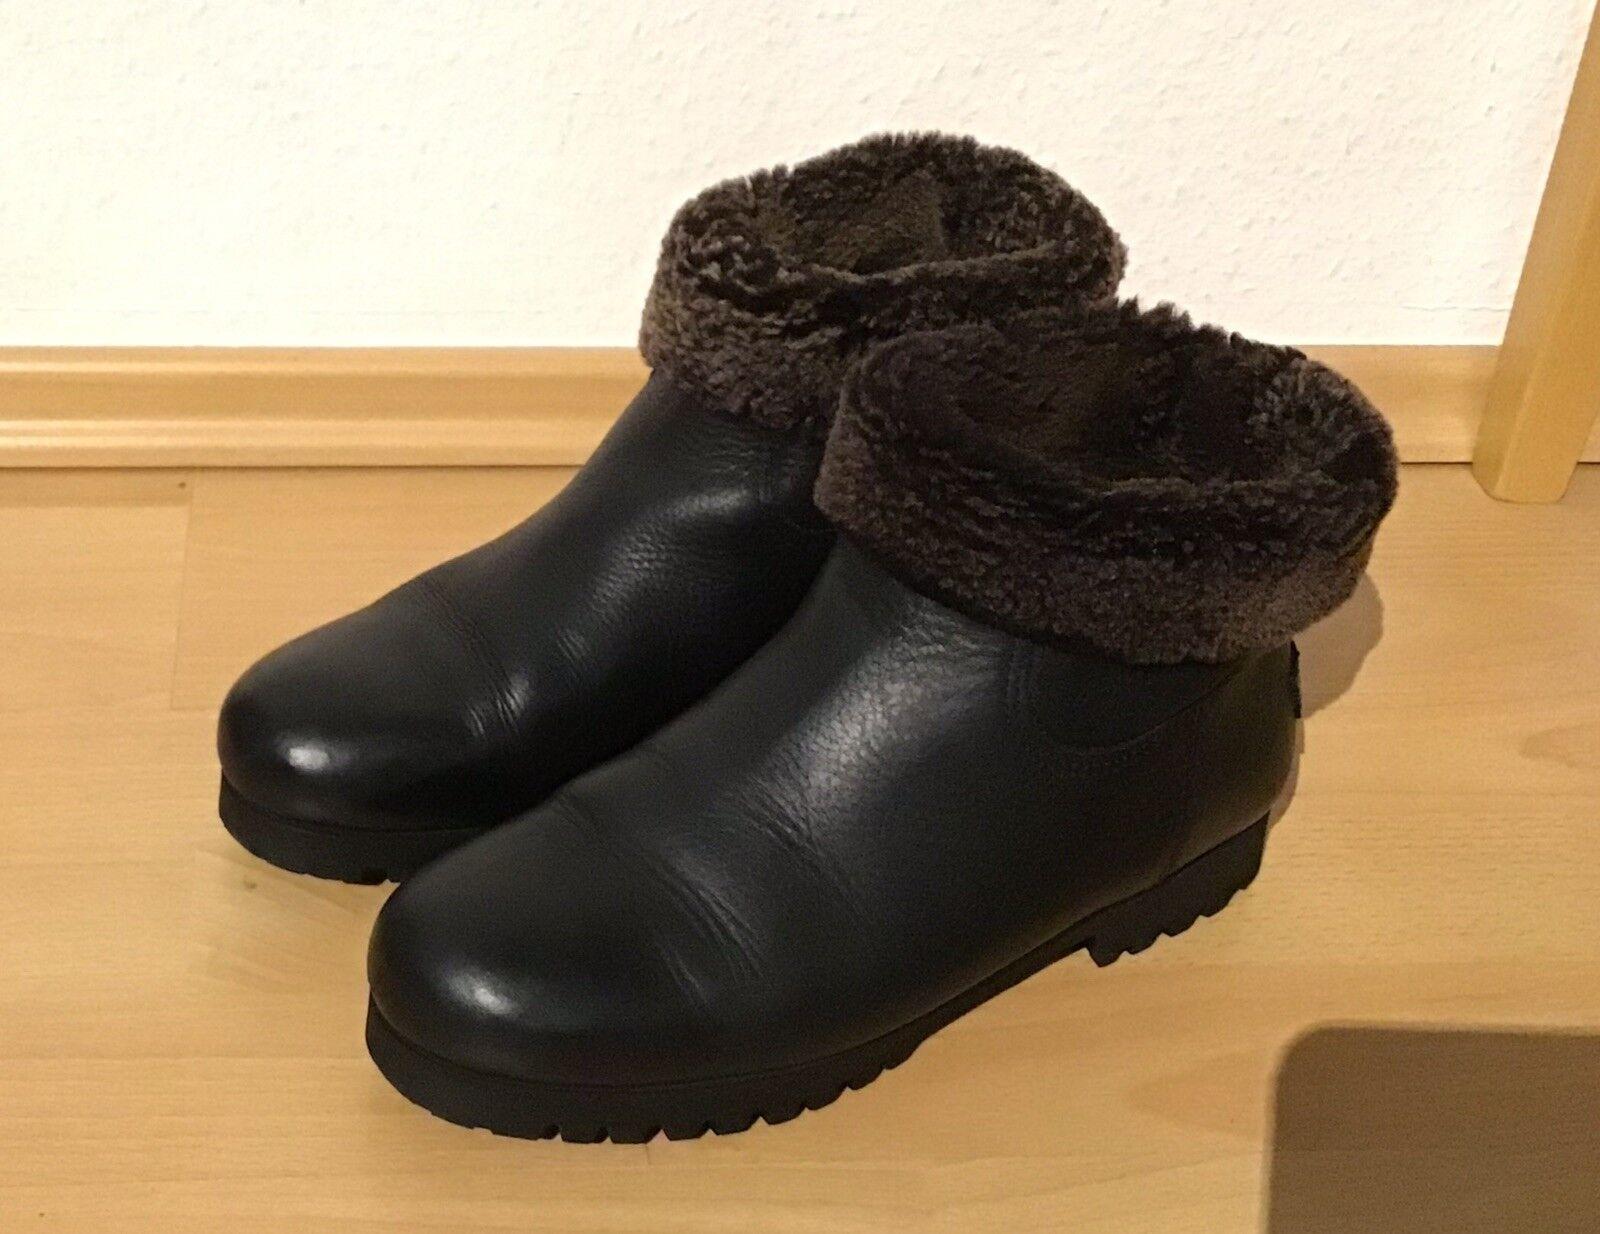 Shabbies Amsterdam Damen Stiefel Lammfell  Gr. 41 schwarz Stiefelette Stiefel